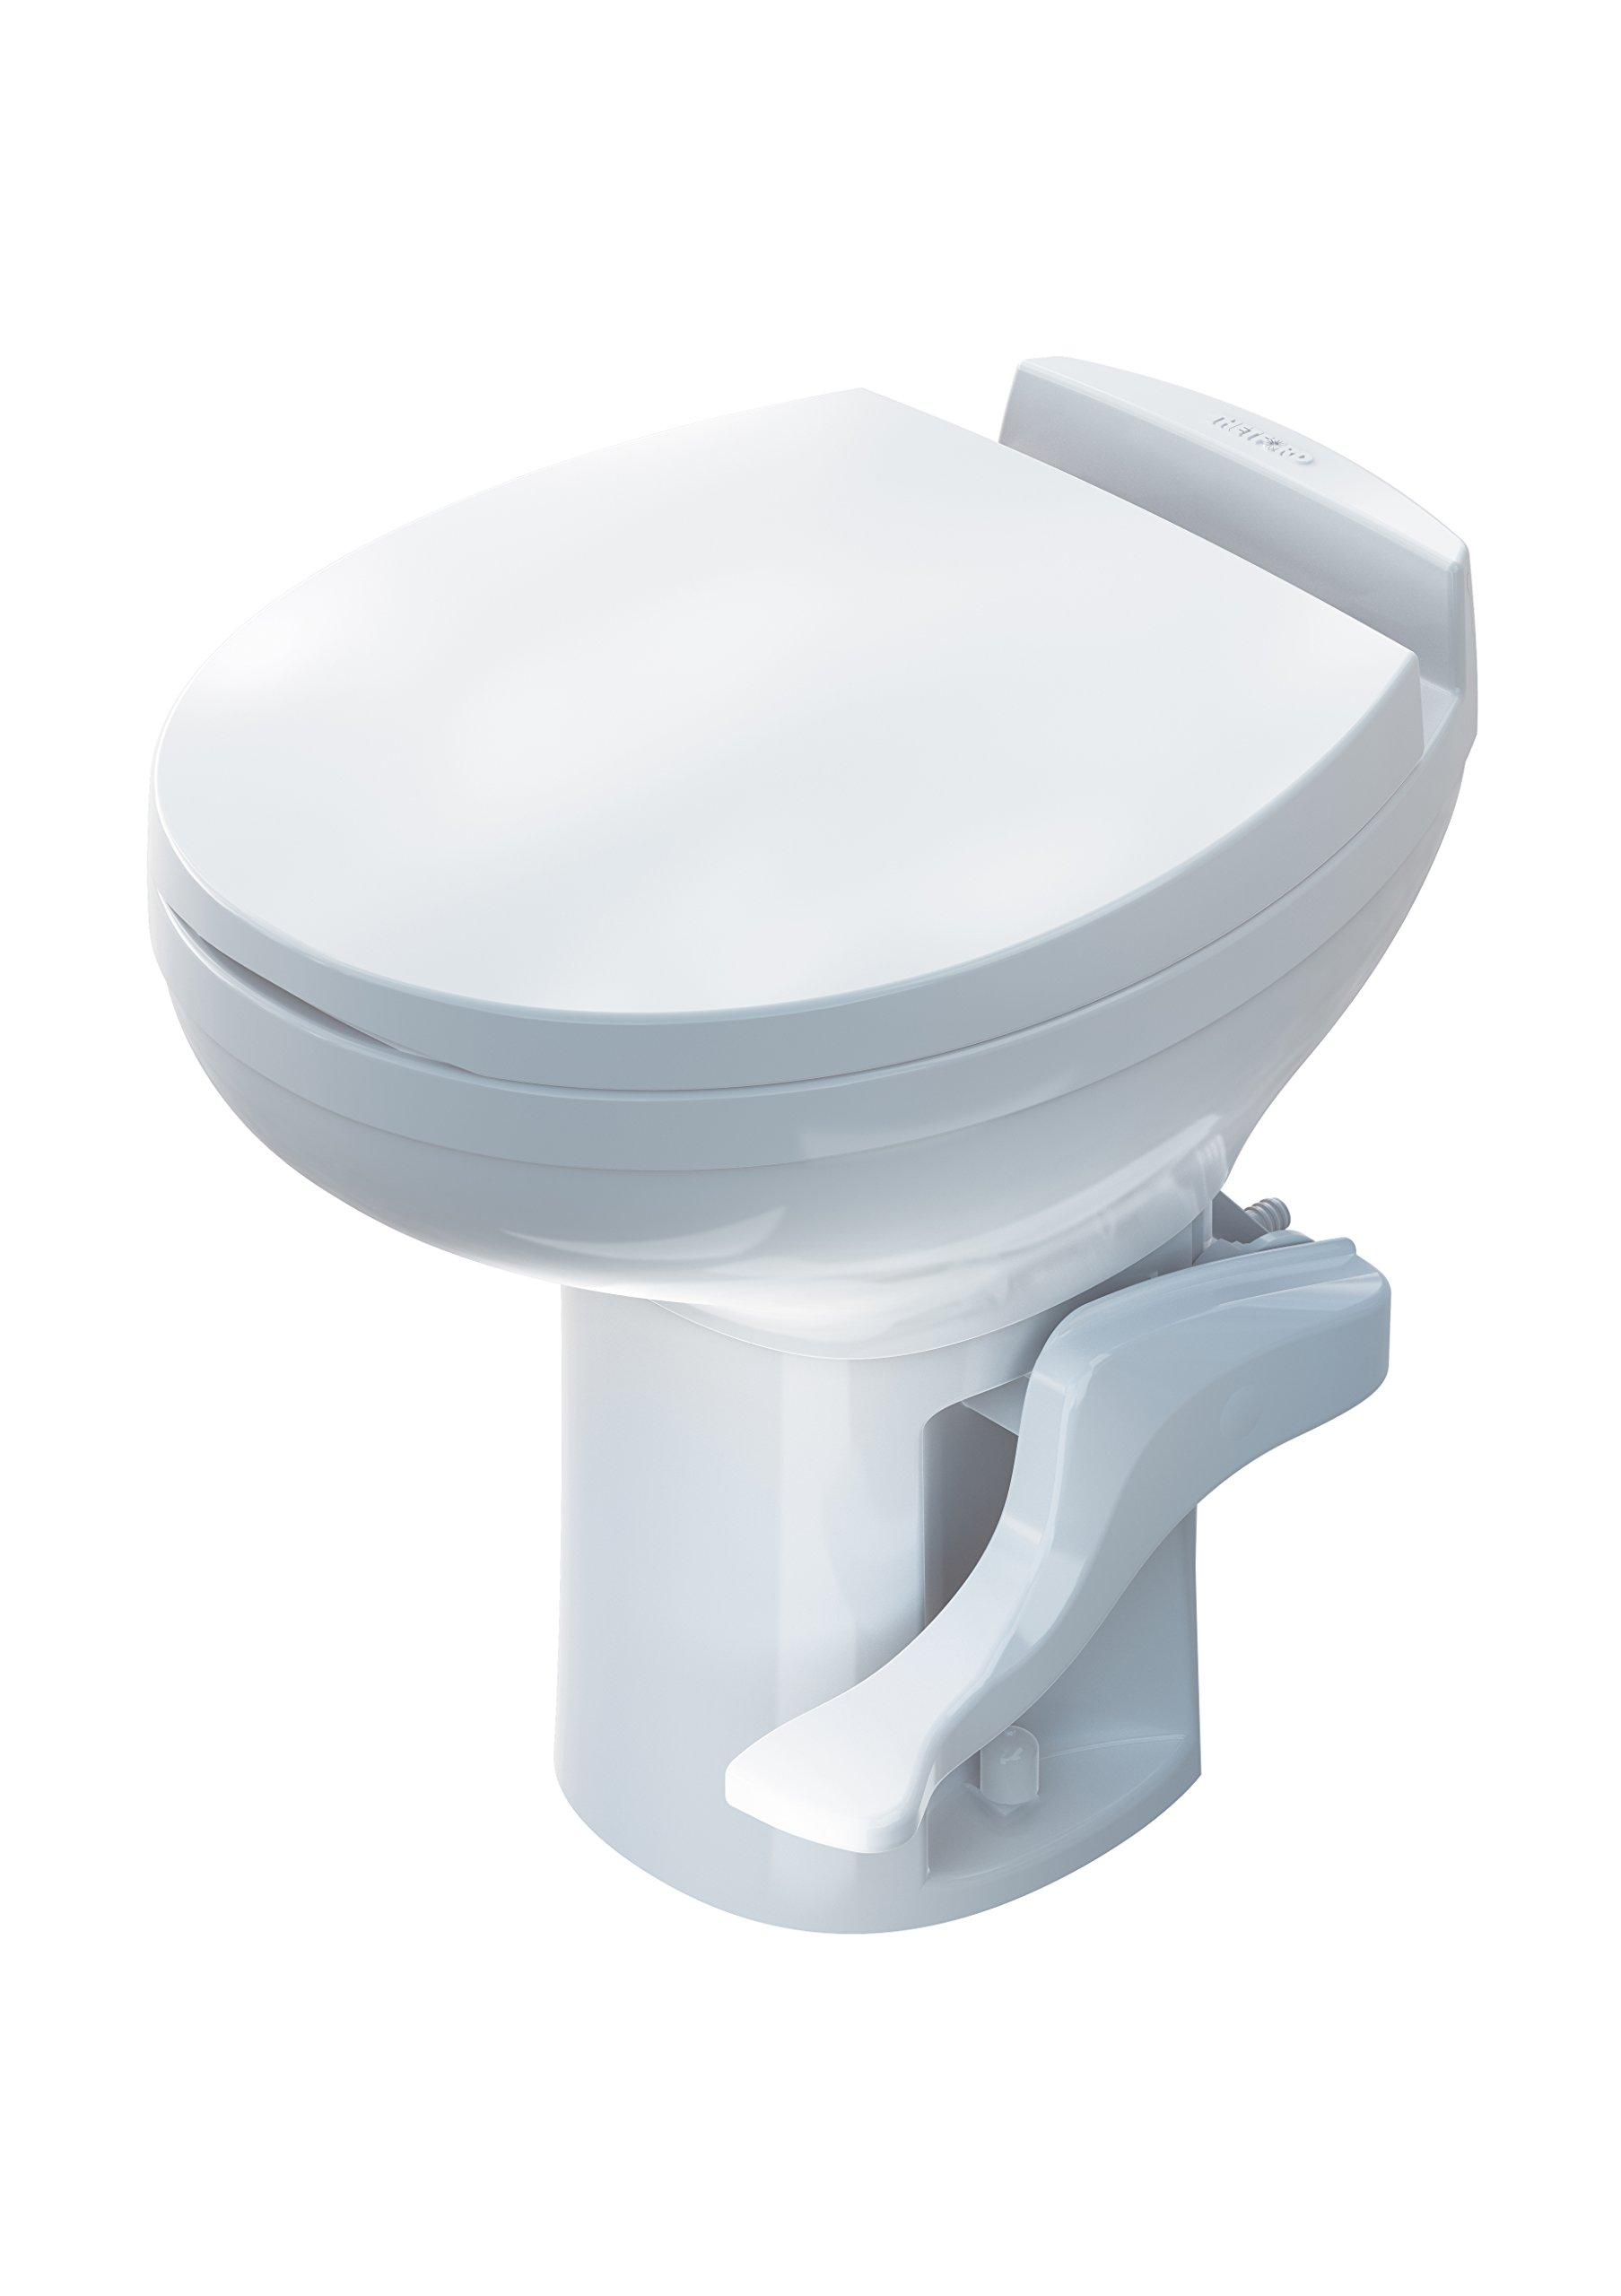 ADA Toilet Heights: Amazon.com